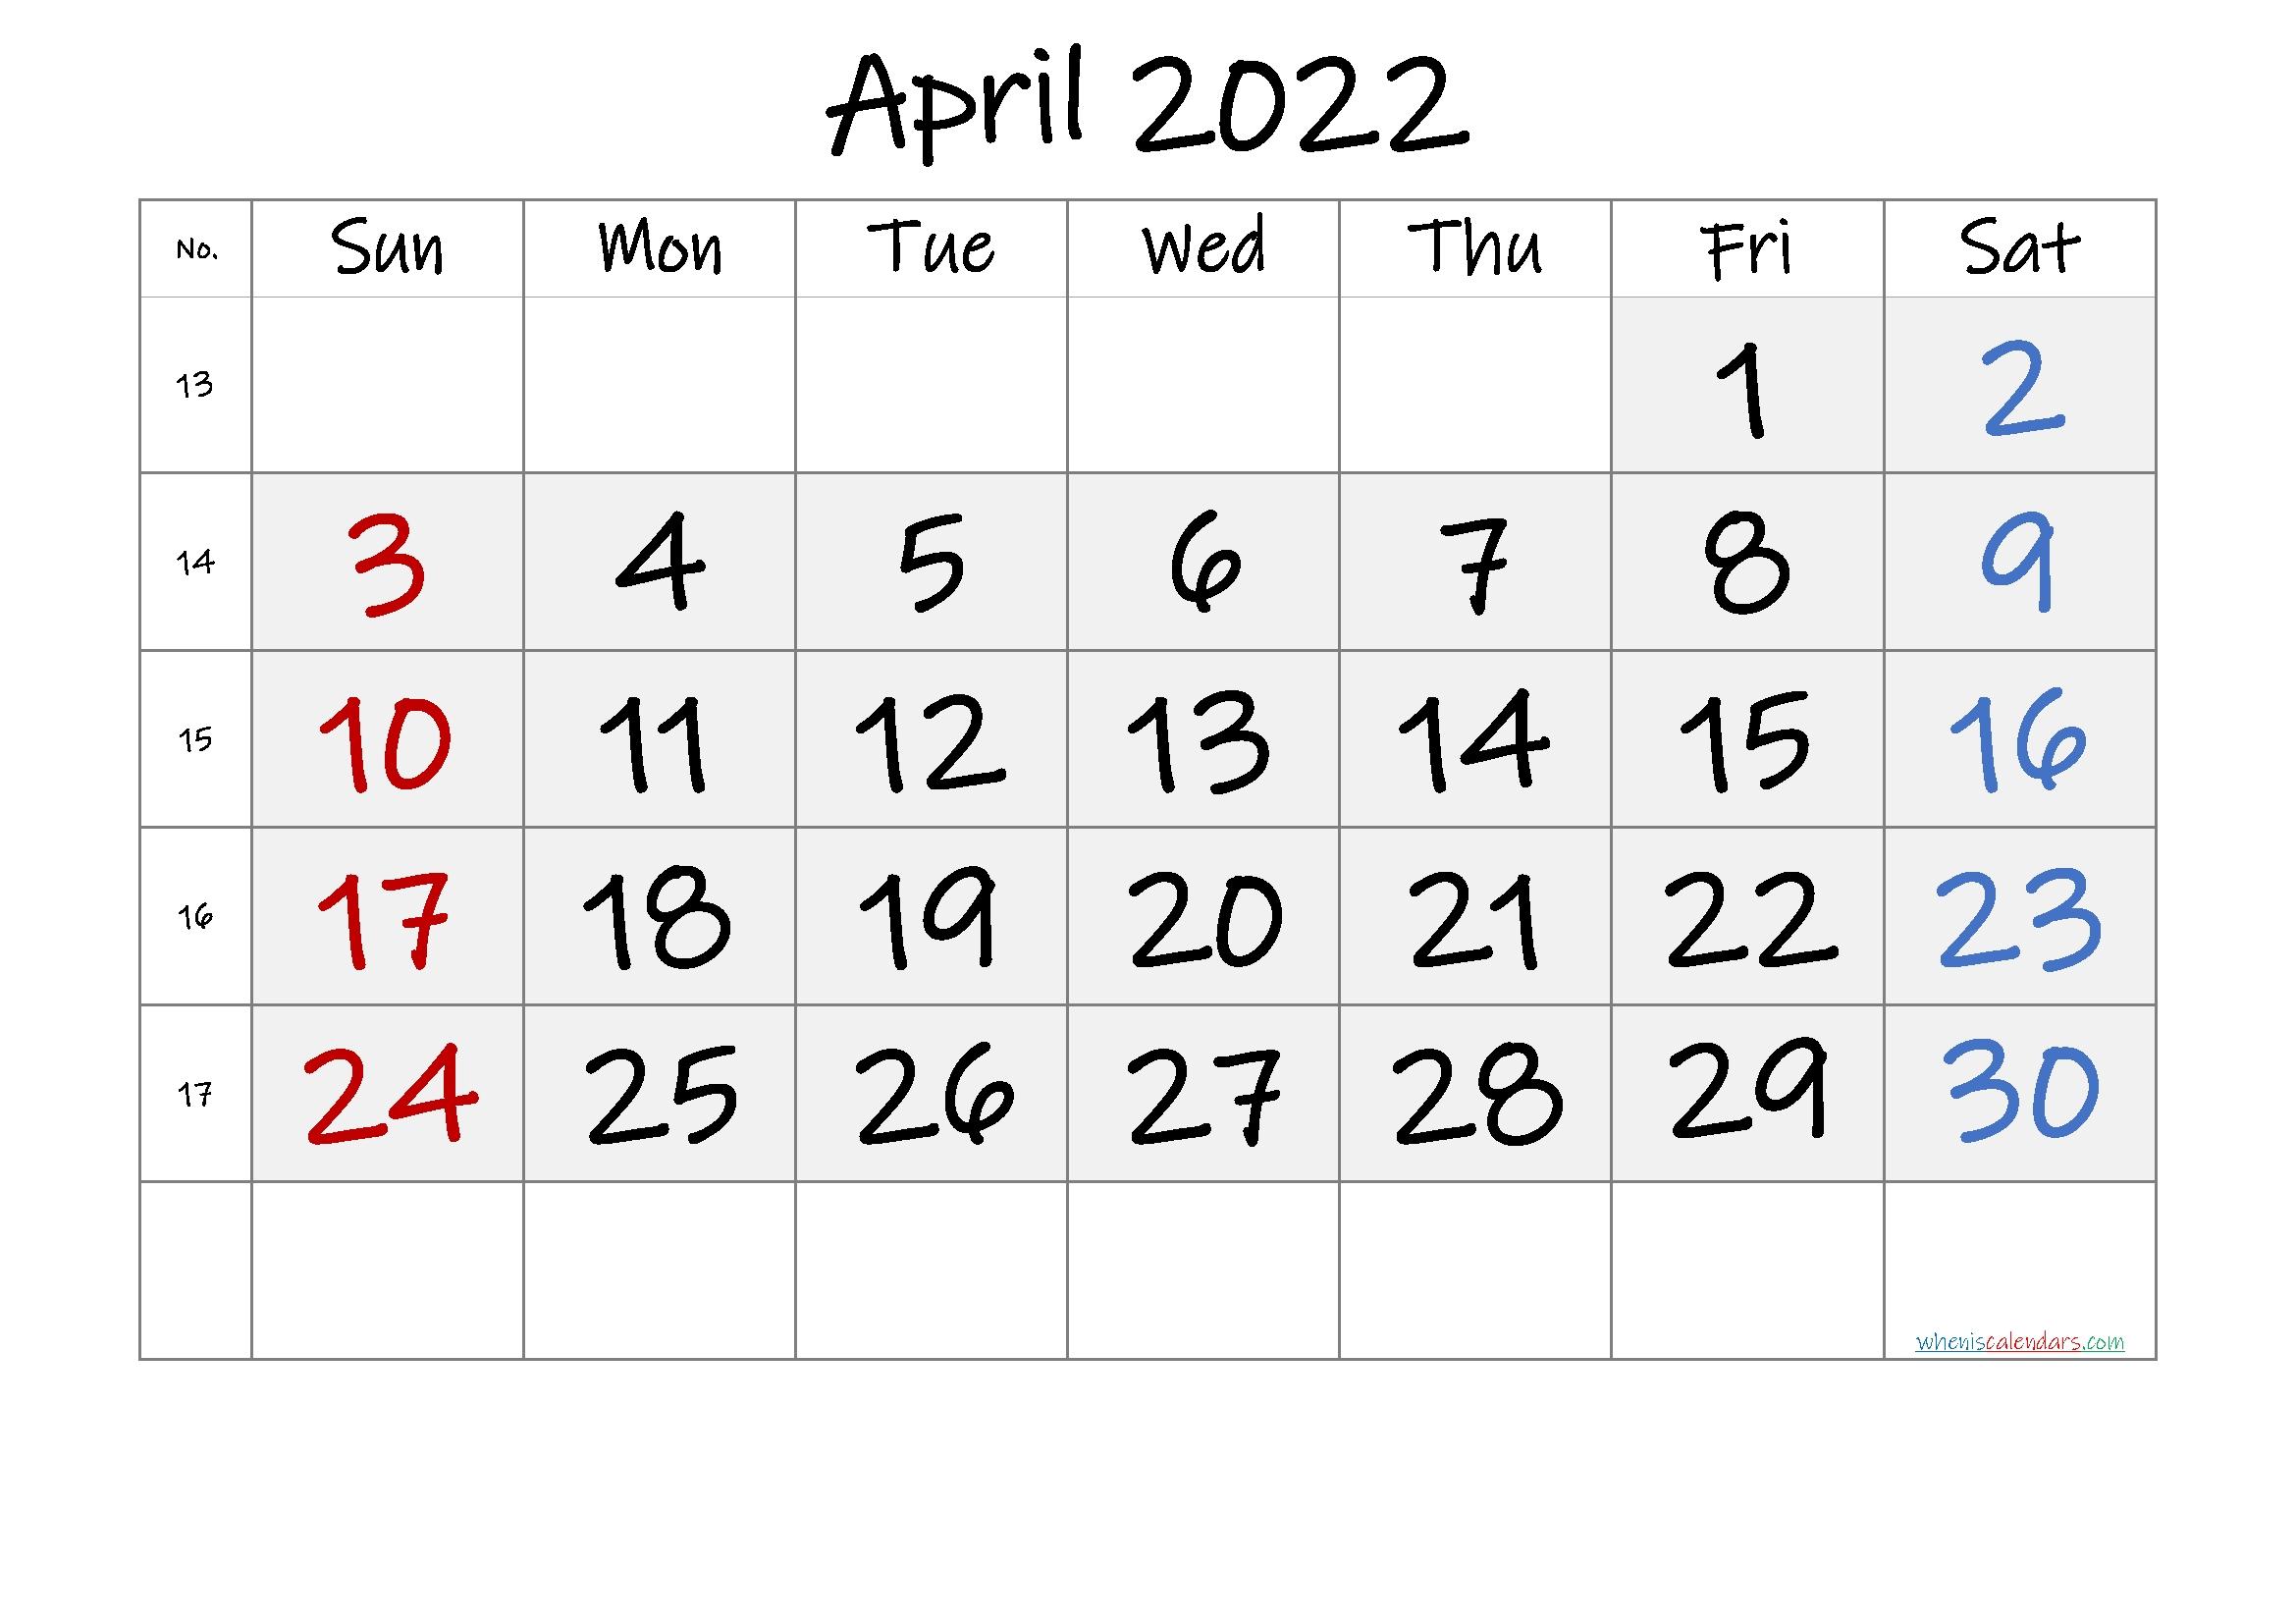 Free Printable April 2022 Calendar - Font: Ink Free